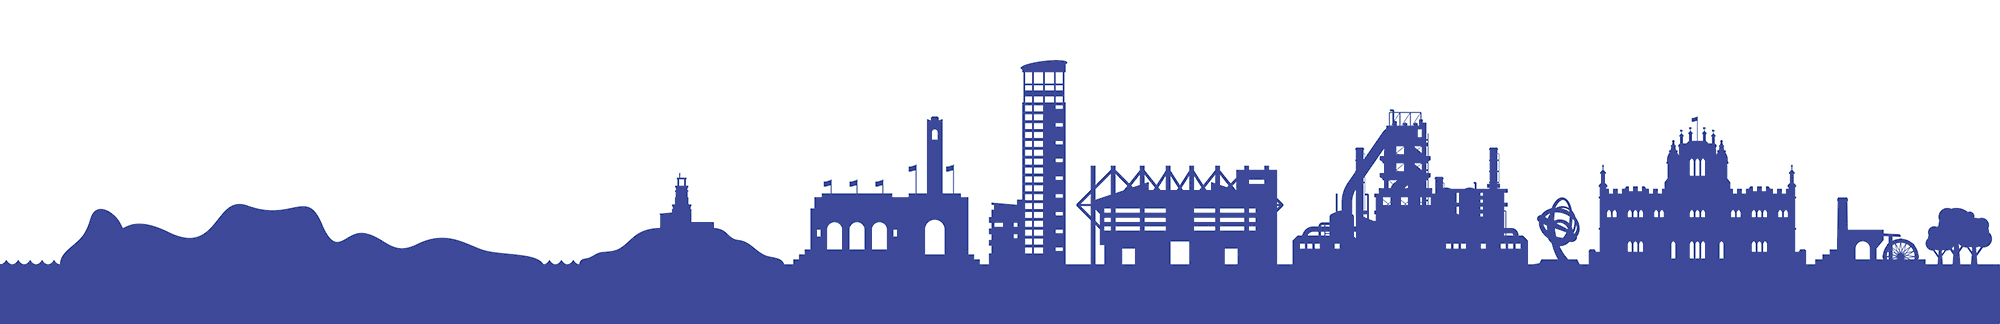 Graphic banner depicting West Glamorgan landmarks